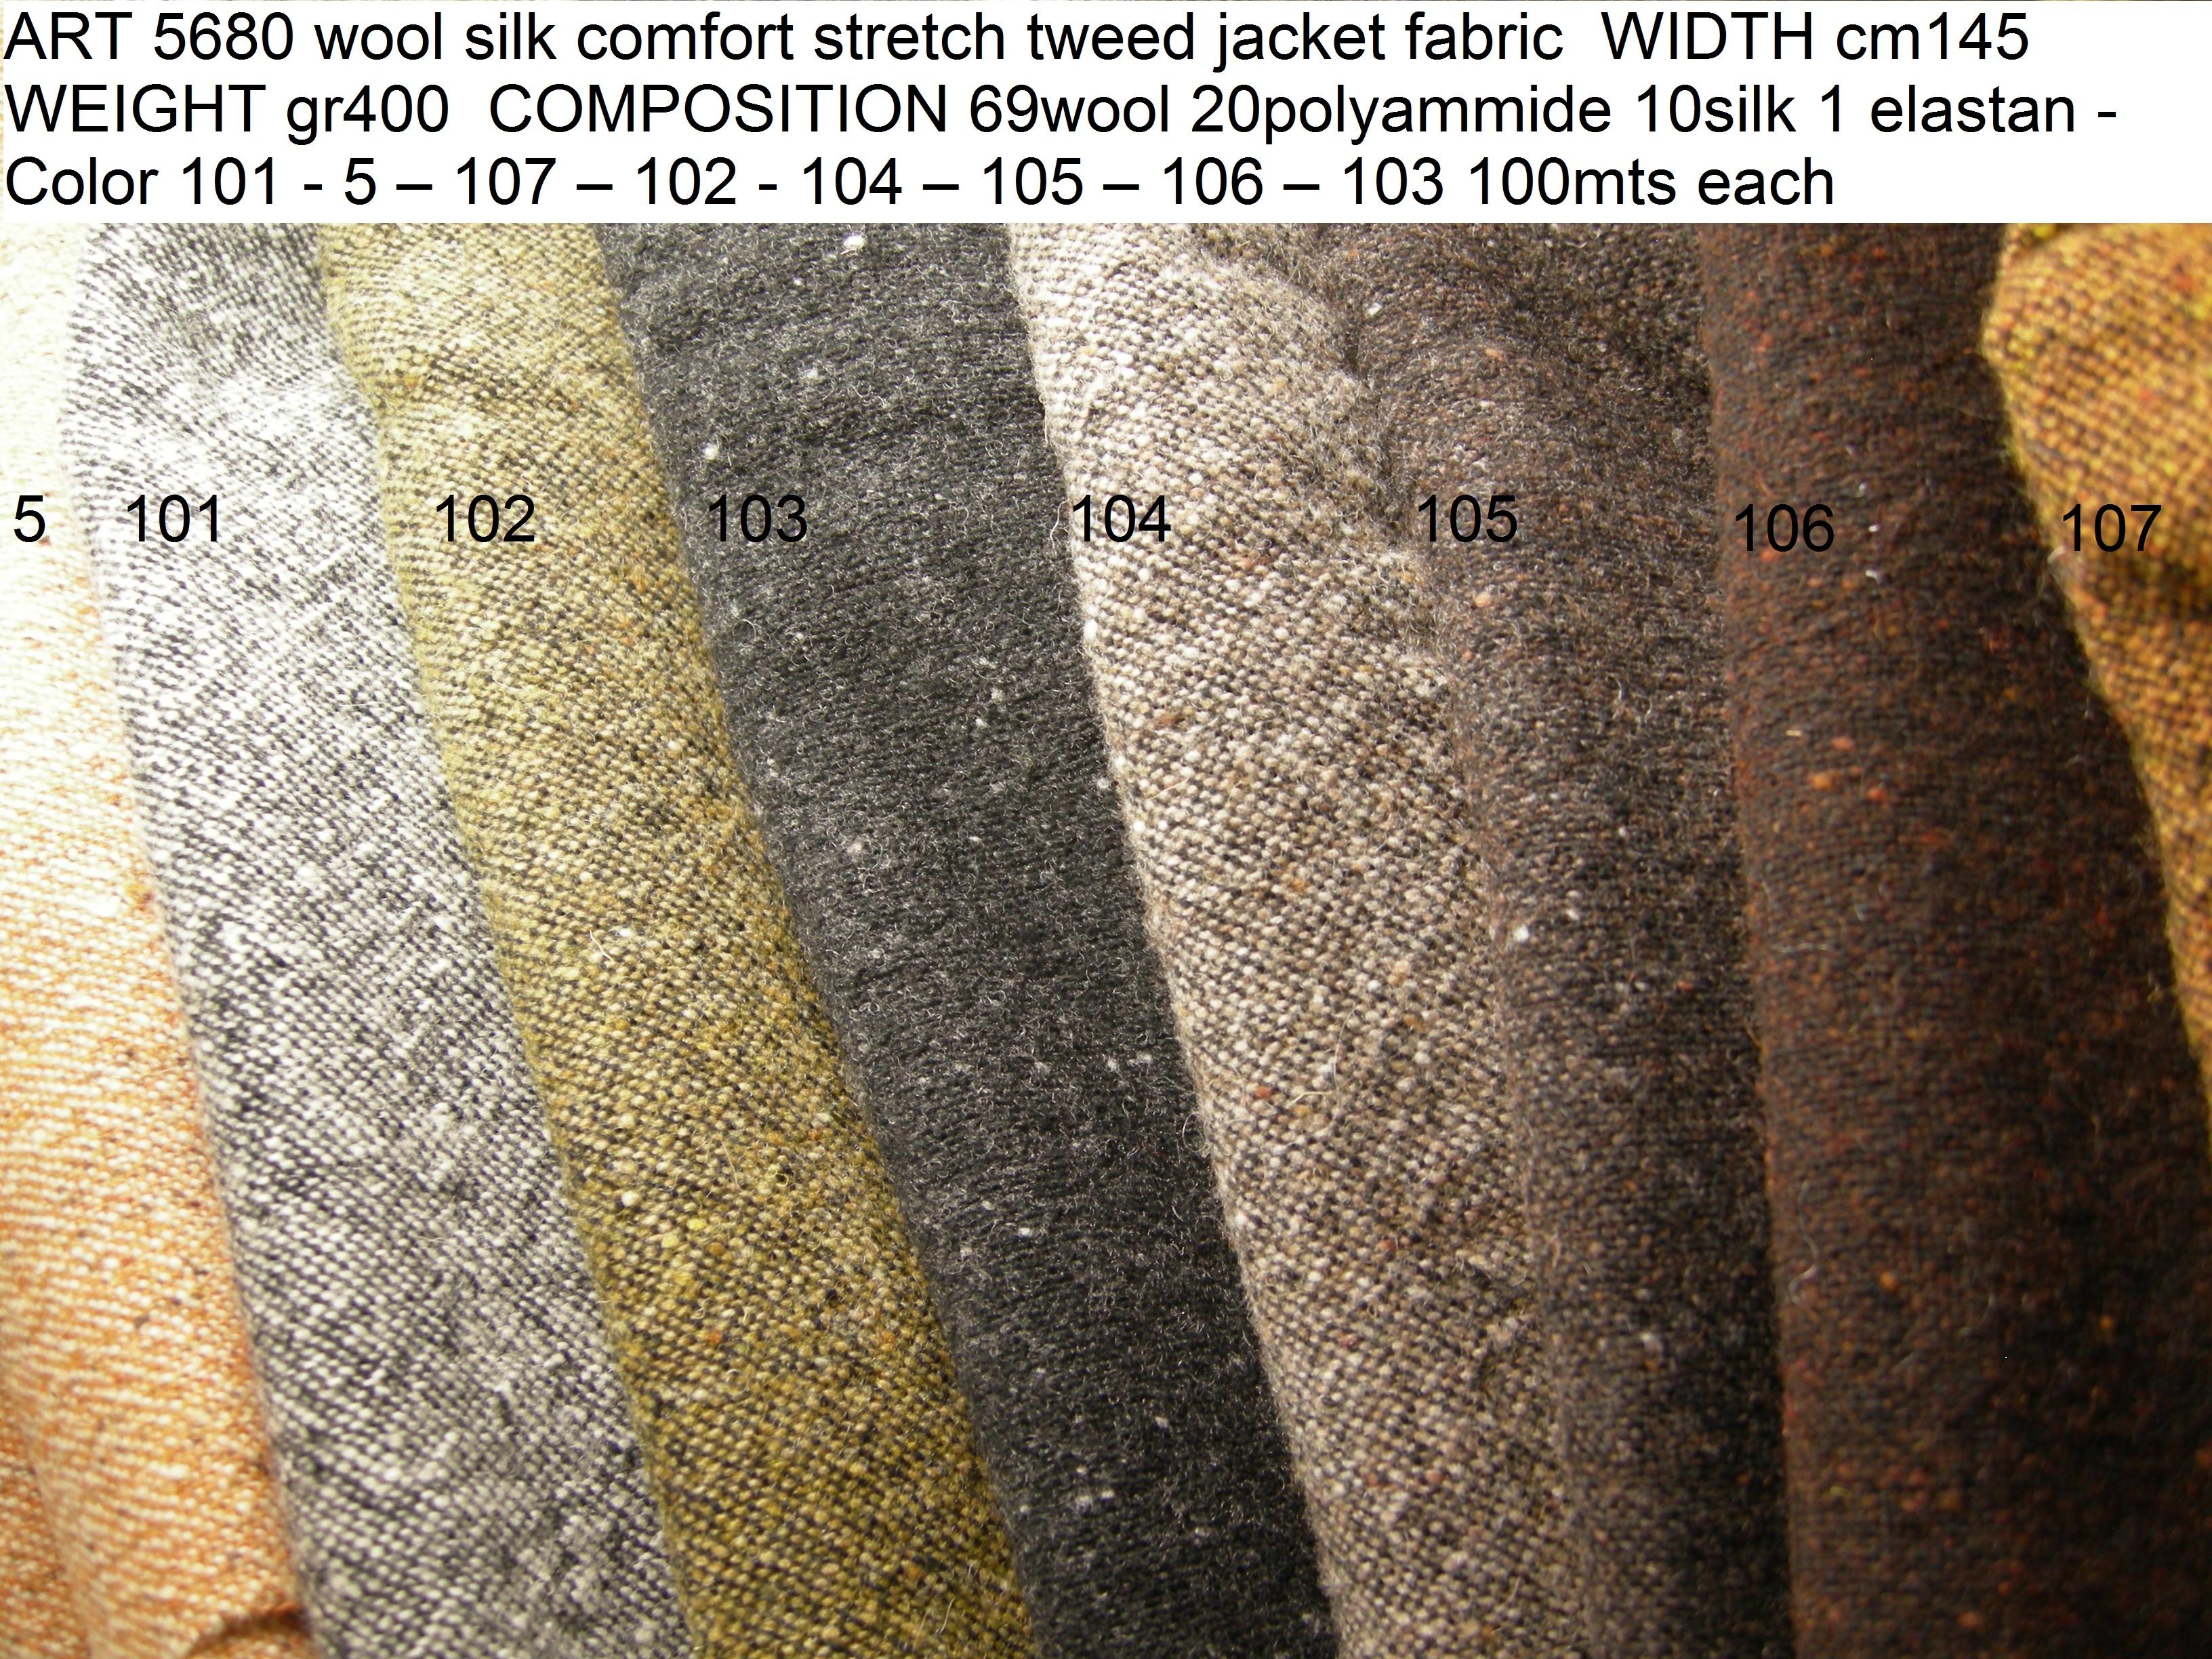 ART 5680 wool silk comfort stretch tweed jacket fabric WIDTH cm145 WEIGHT gr400 COMPOSITION 69wool 20polyammide 10silk 1 elastan - Color 101 - 5 – 107 – 102 - 104 – 105 – 106 – 103 100mts each